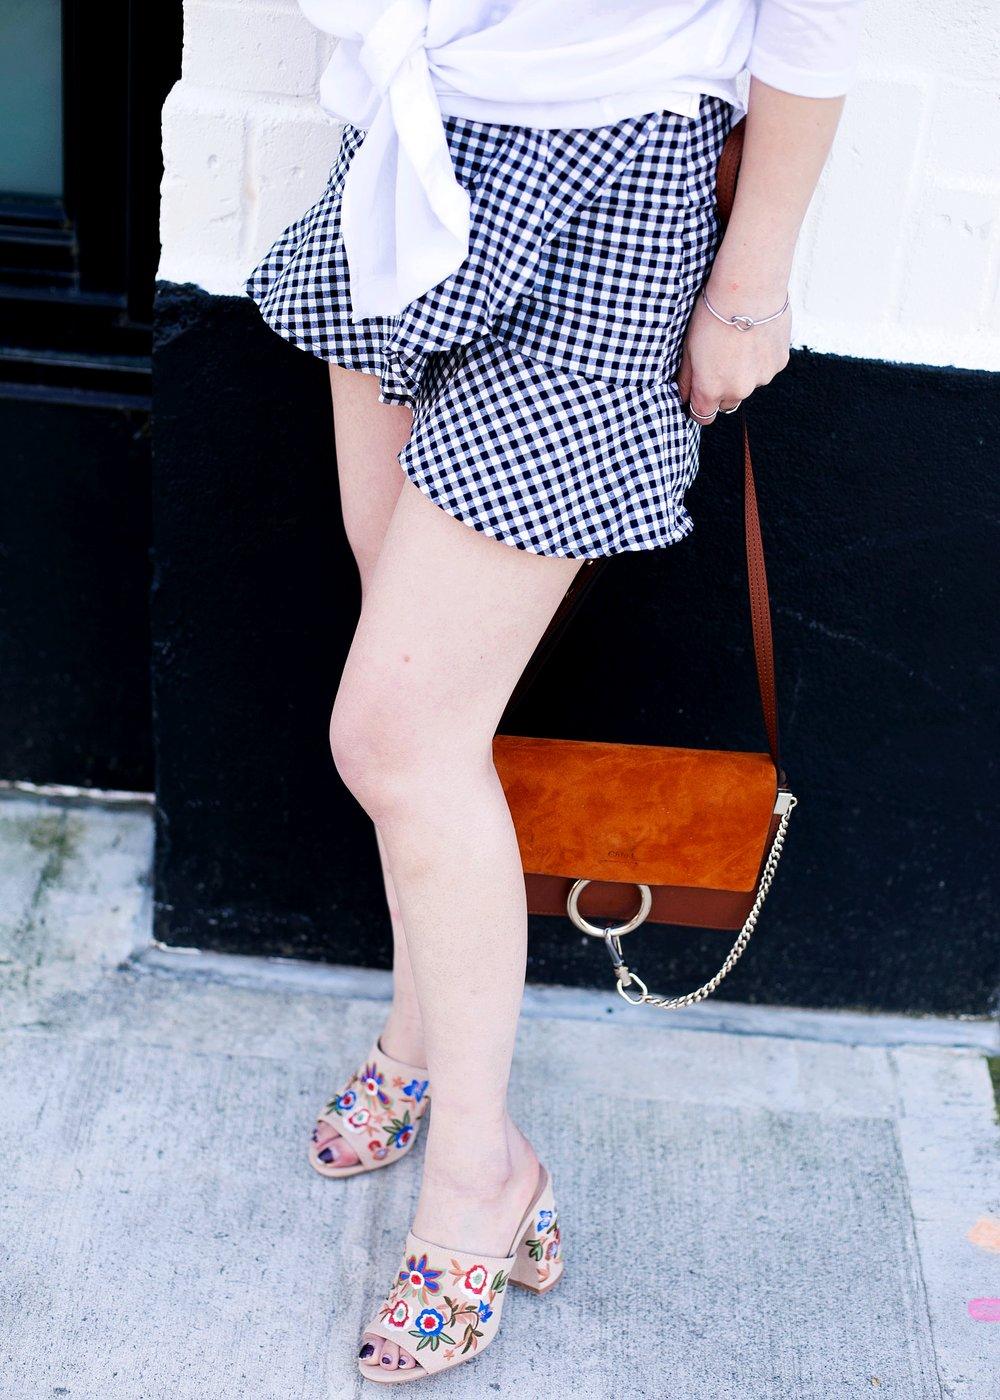 Aldo Yaessi Floral-Embroidered Mules- H&M Gingham mini skirt - Chloe Mini Faye Bag - Aika's Love Closet - Seattle Fashion Style Blogger - Japanese